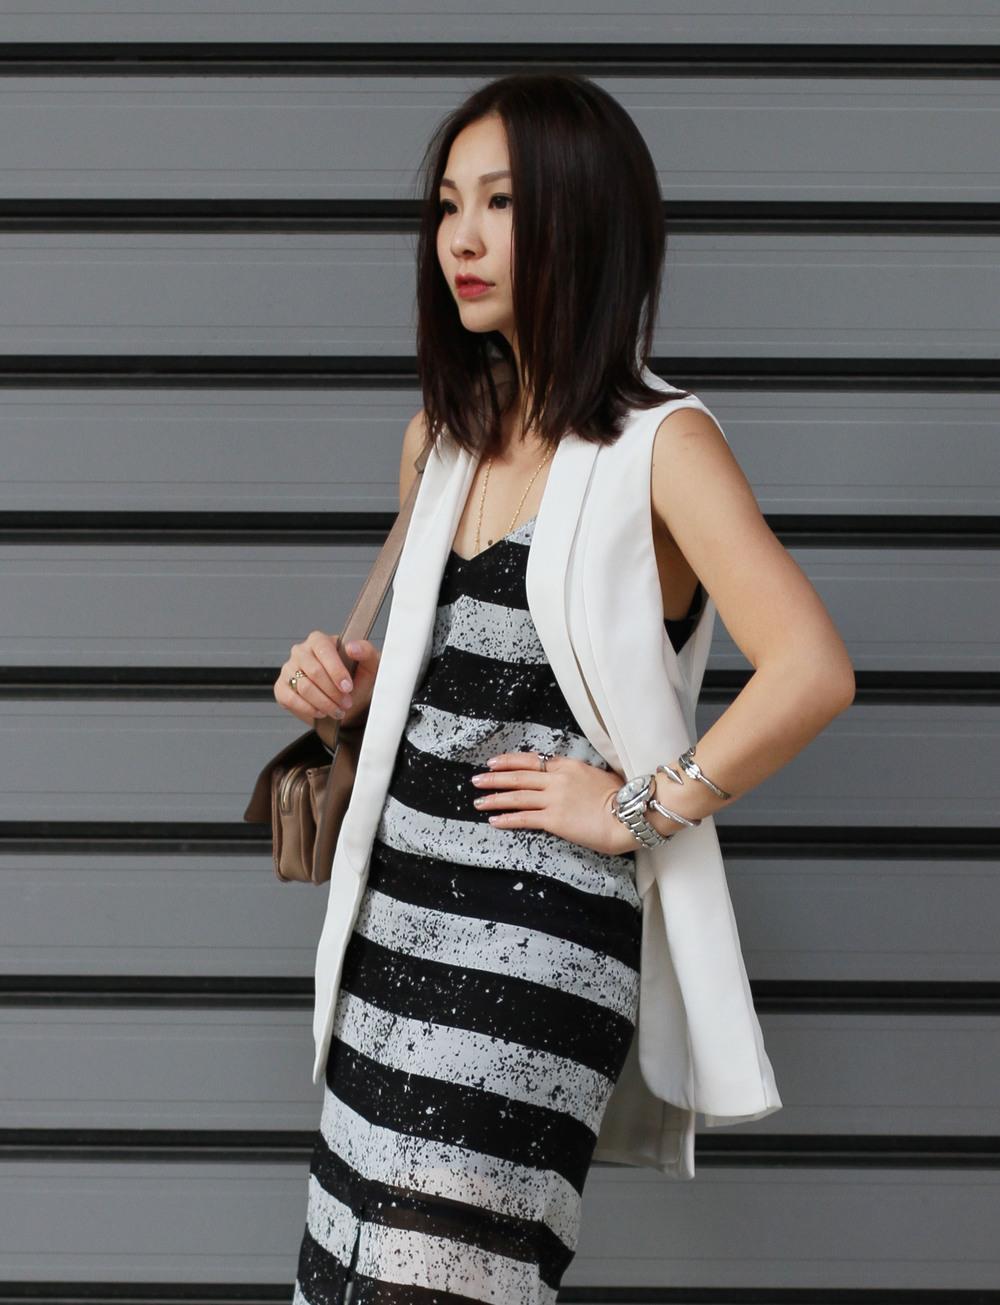 dress and vest.jpg